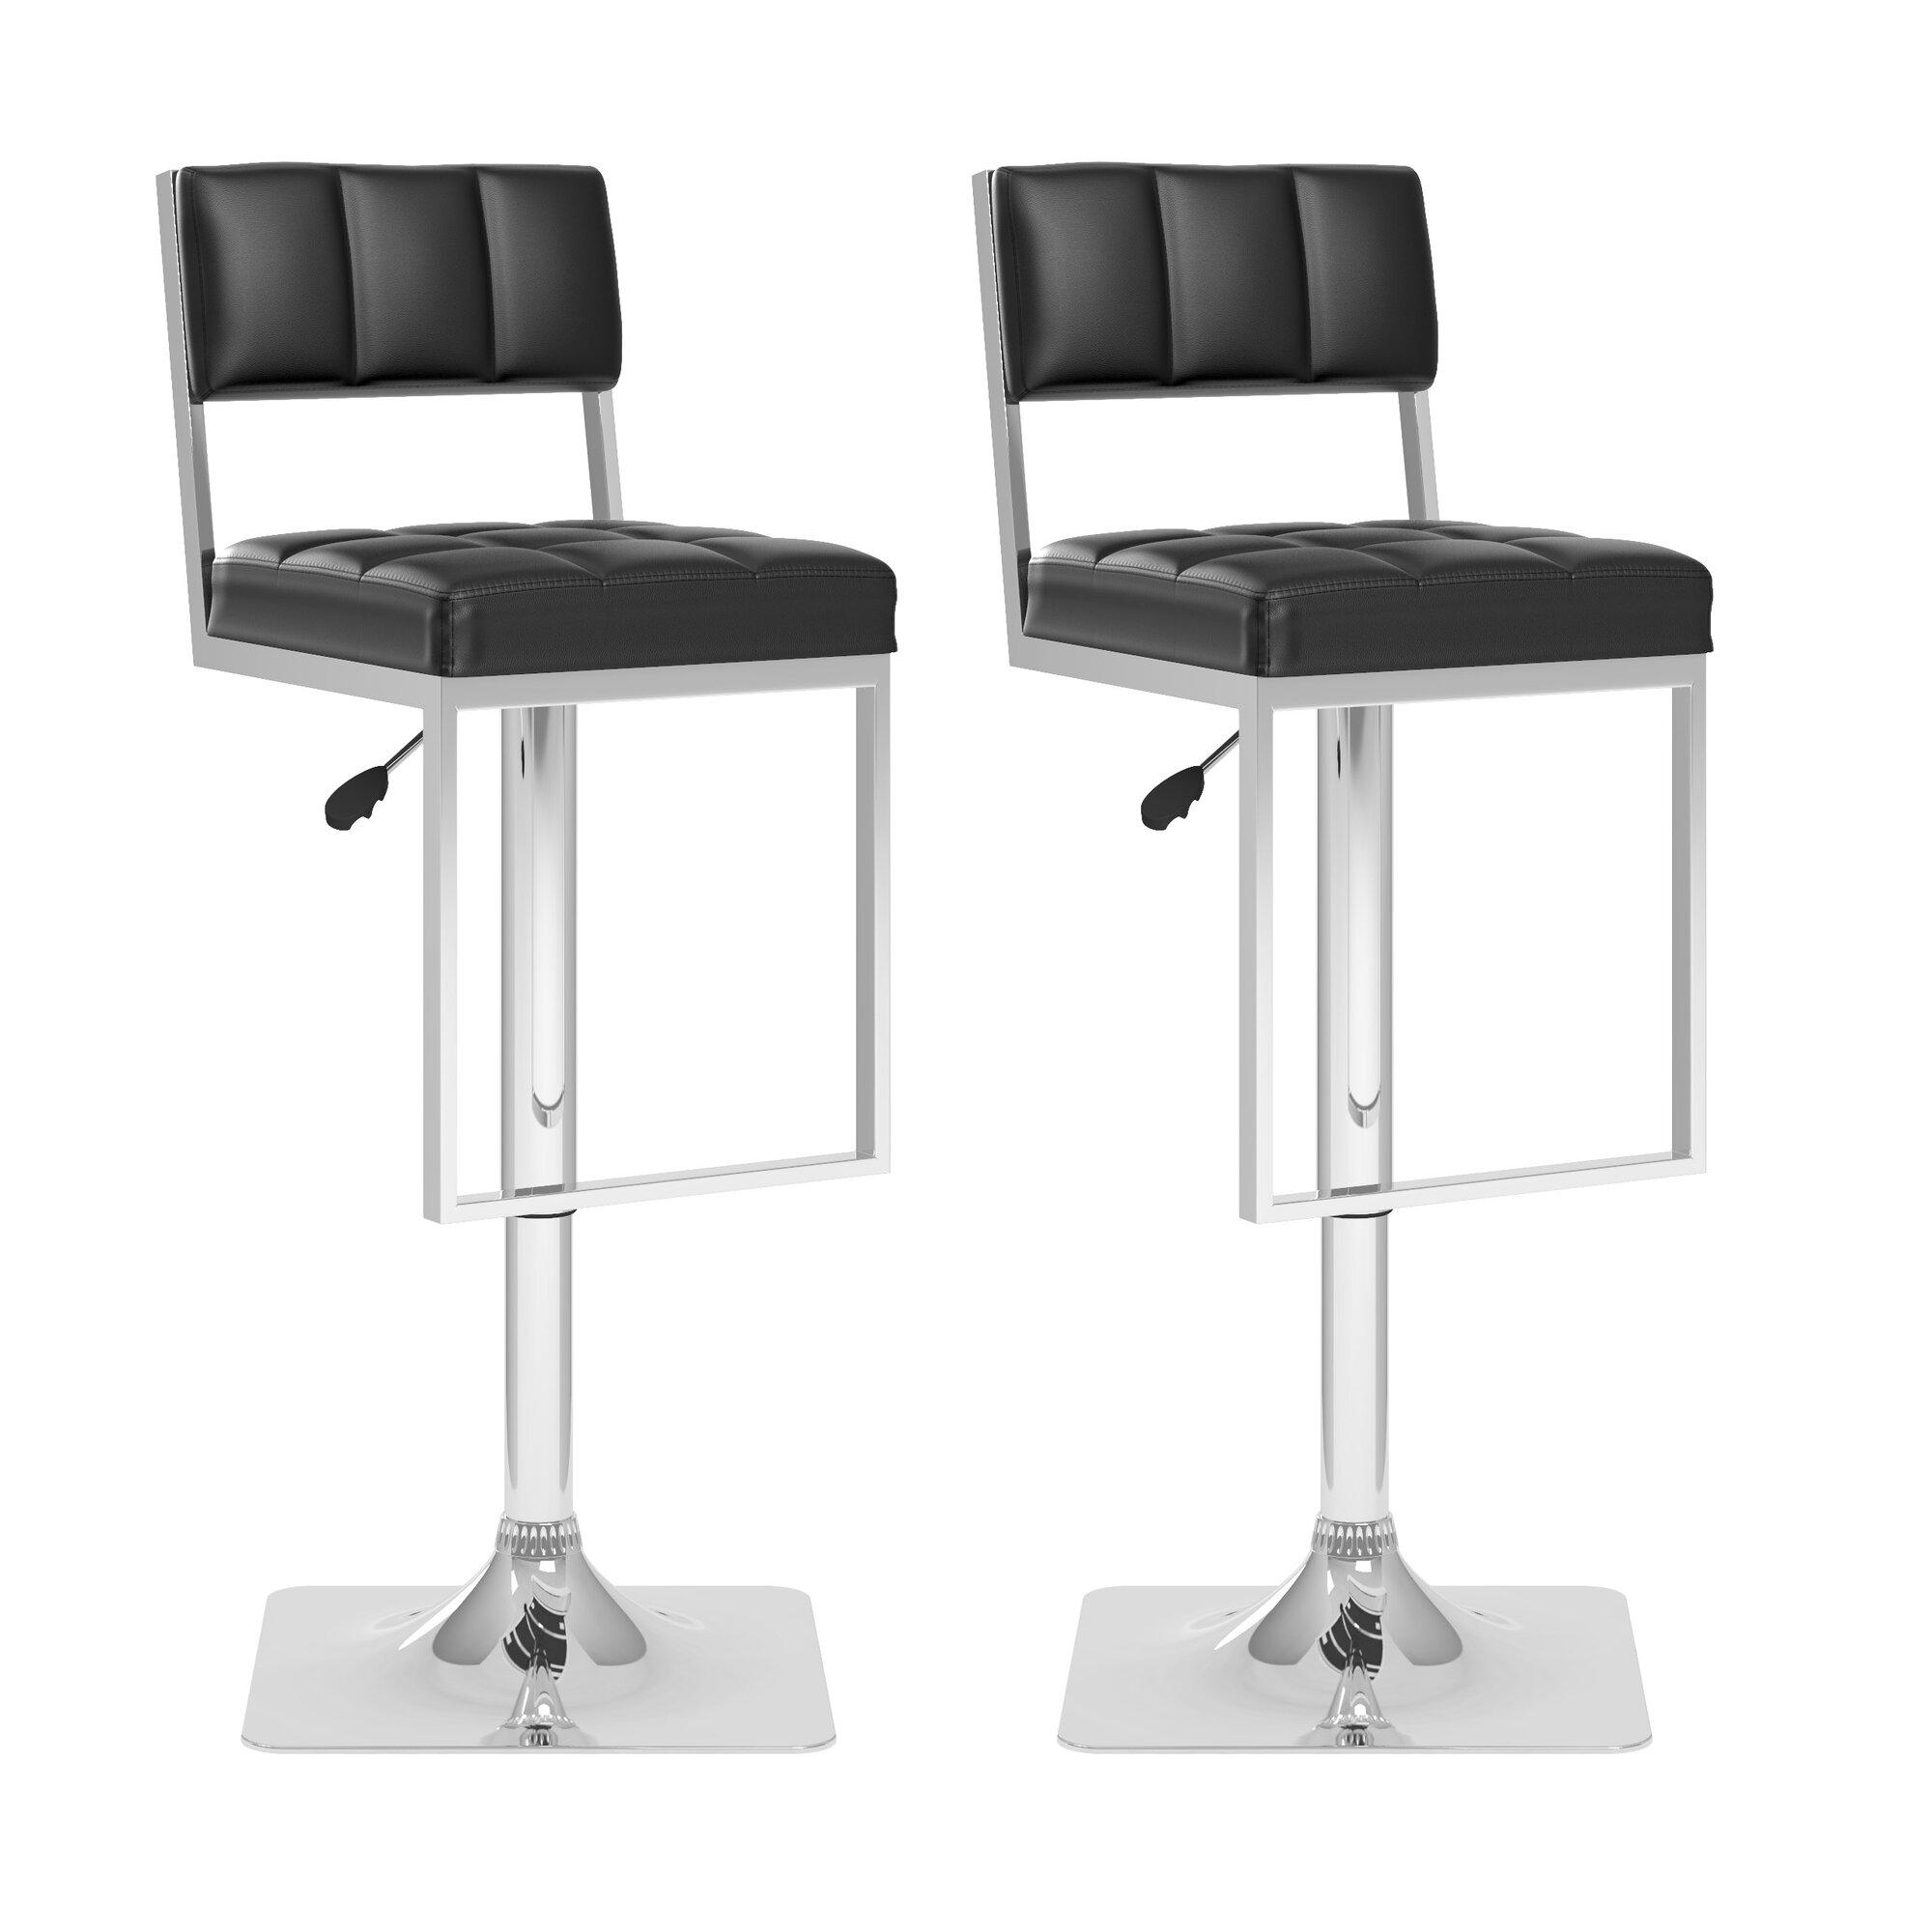 CorLiving Adjustable Height Swivel Bar Stool & Reviews | Wayfair